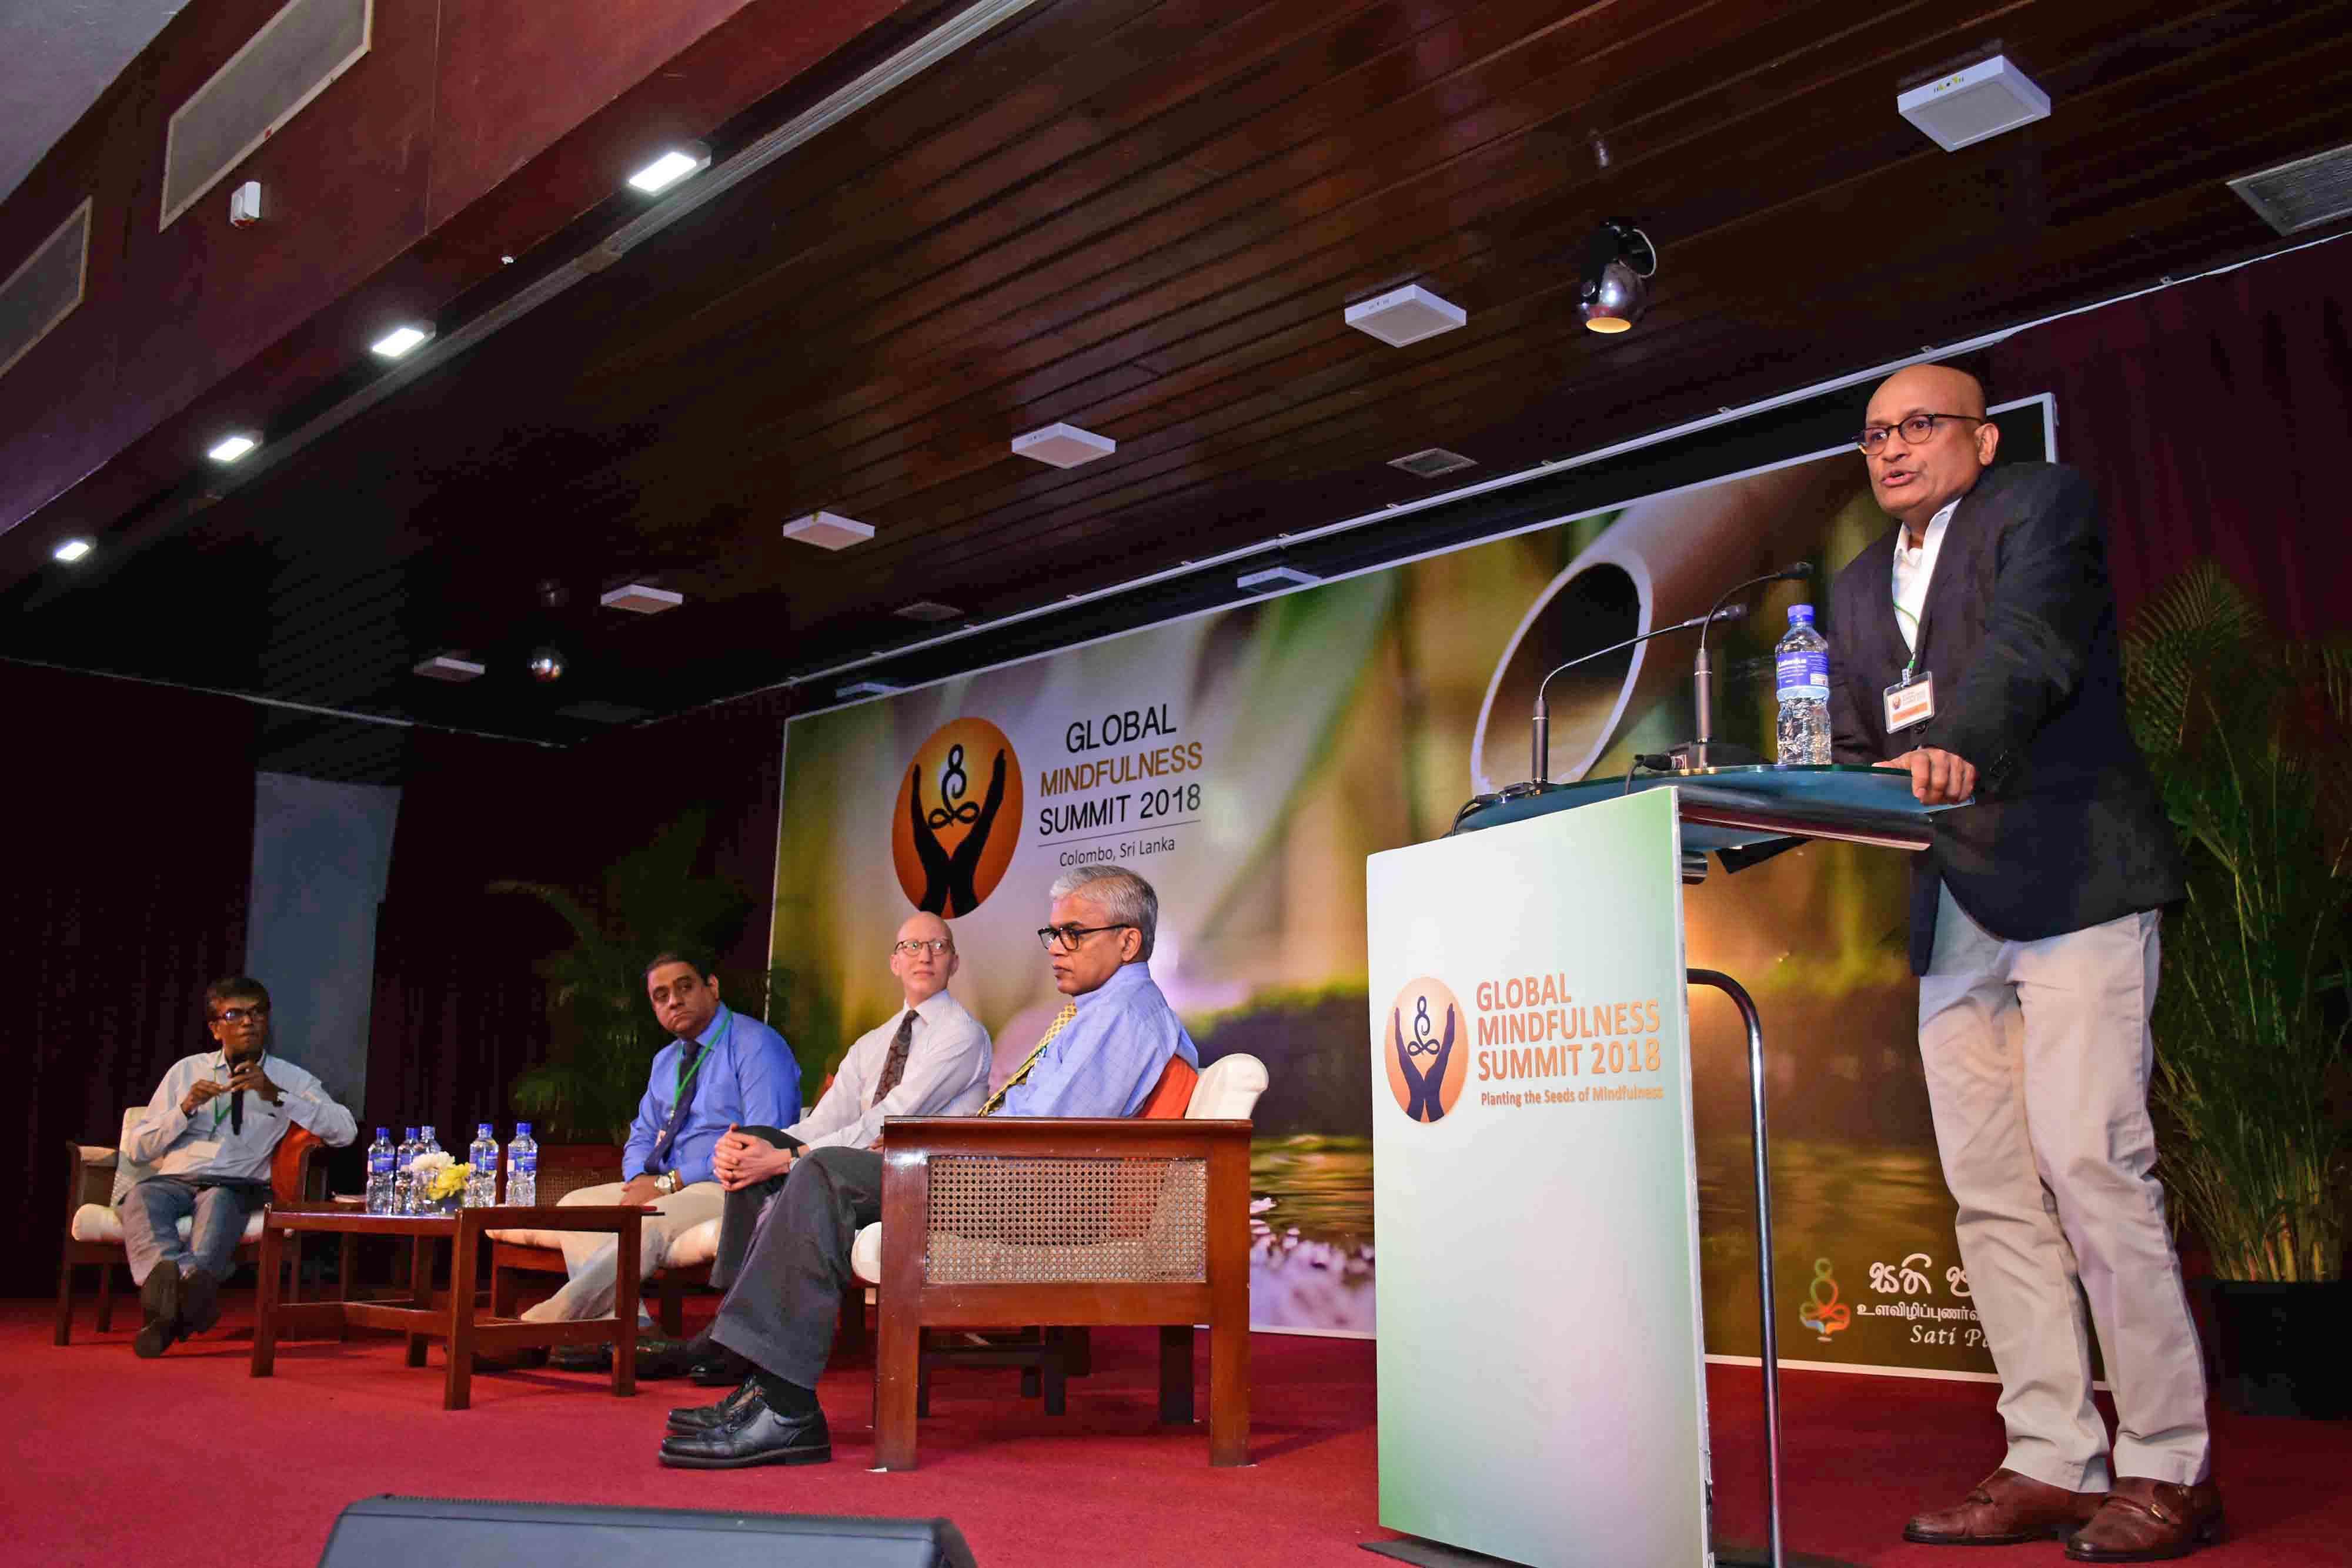 Global Mindfulness Summit 2018 - Day2 (24)